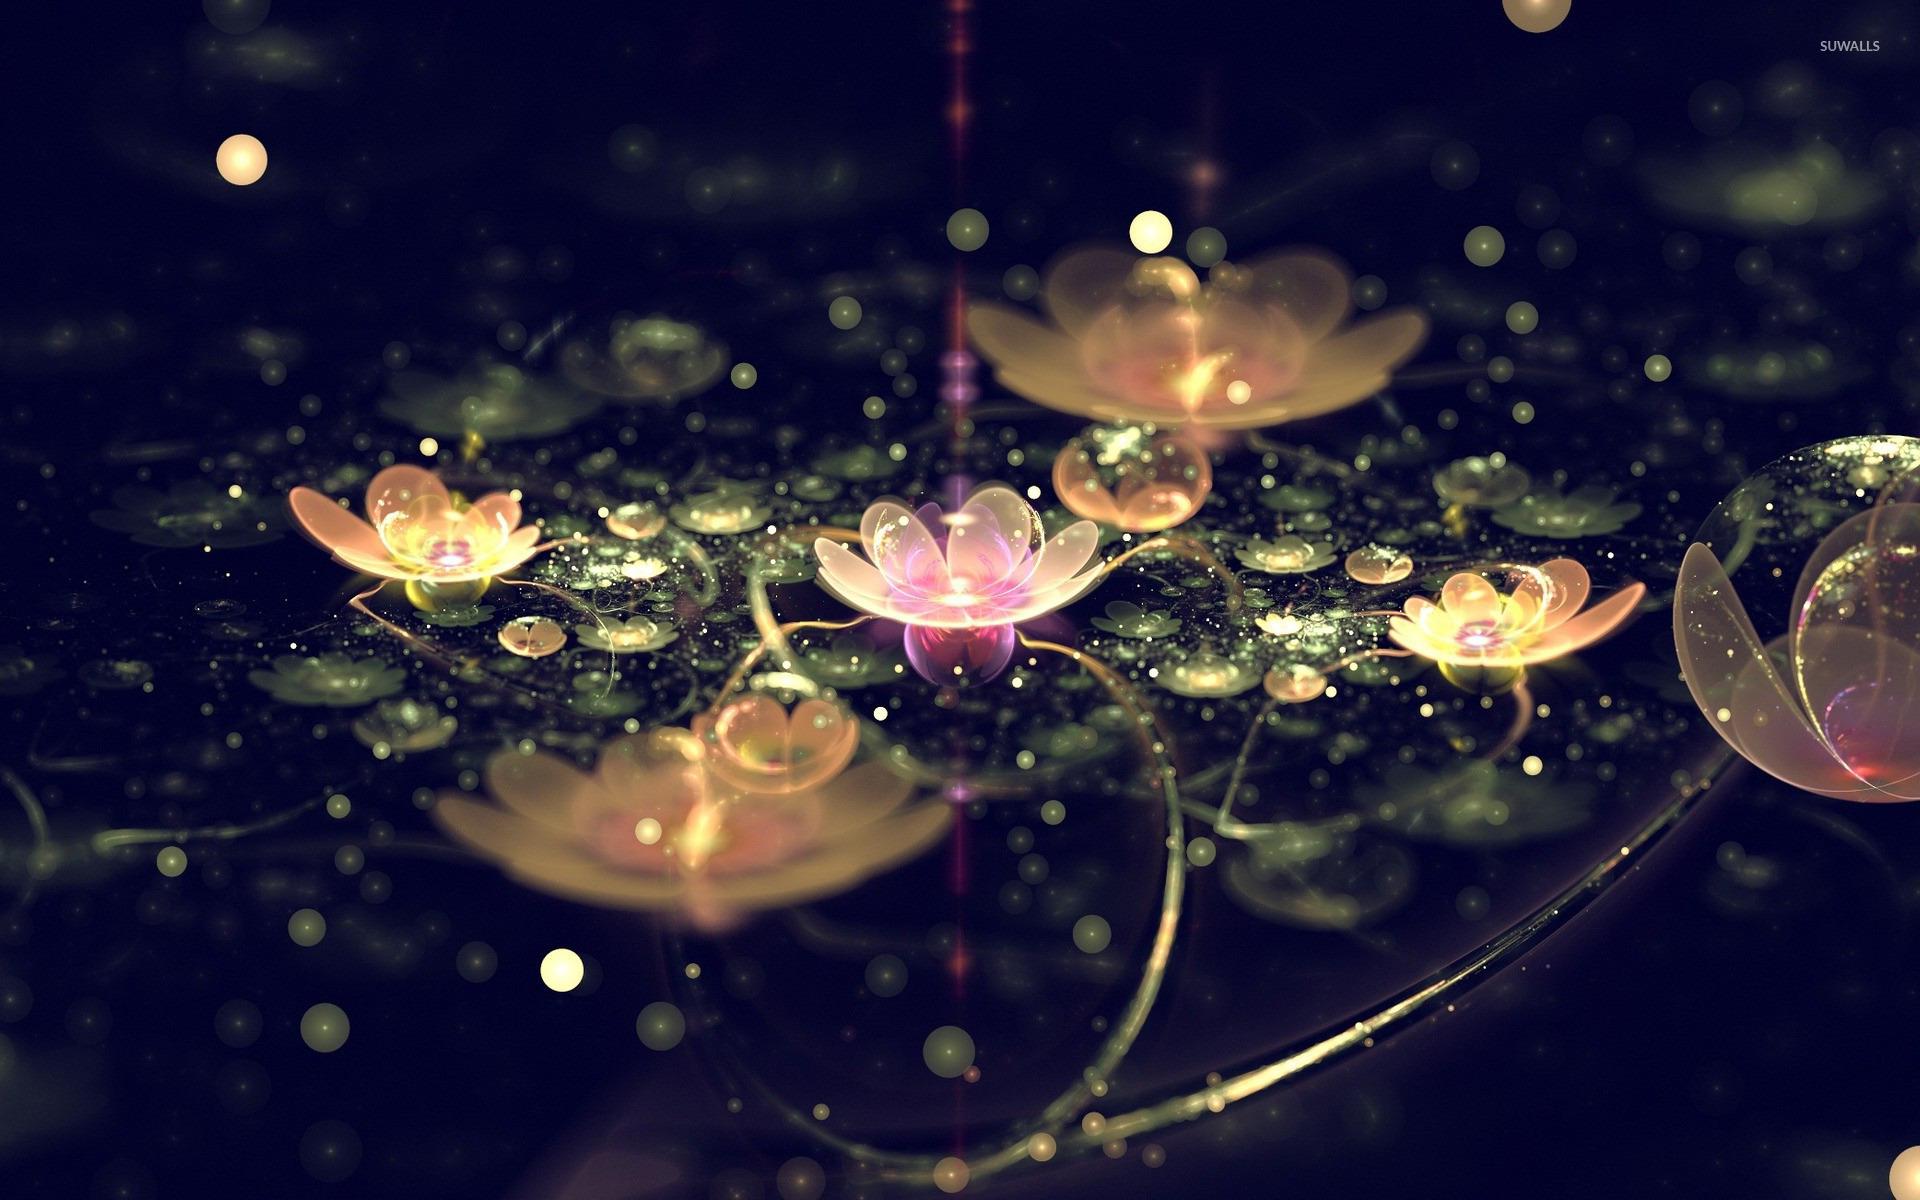 D digital art green lake full of water lilies